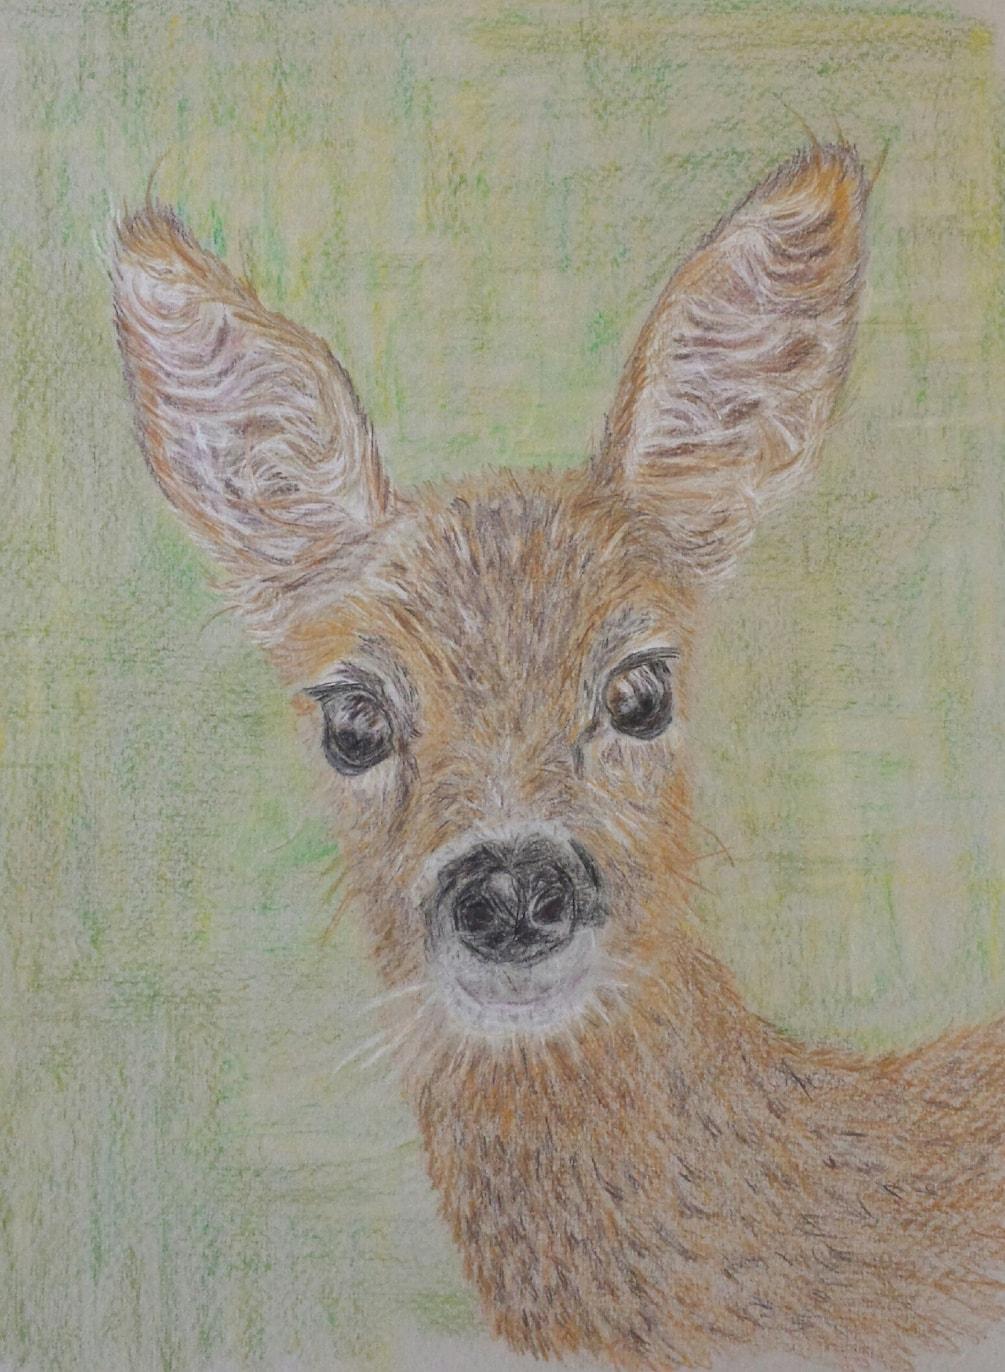 Paul hopkinson deer exercise from summer 2018 issue